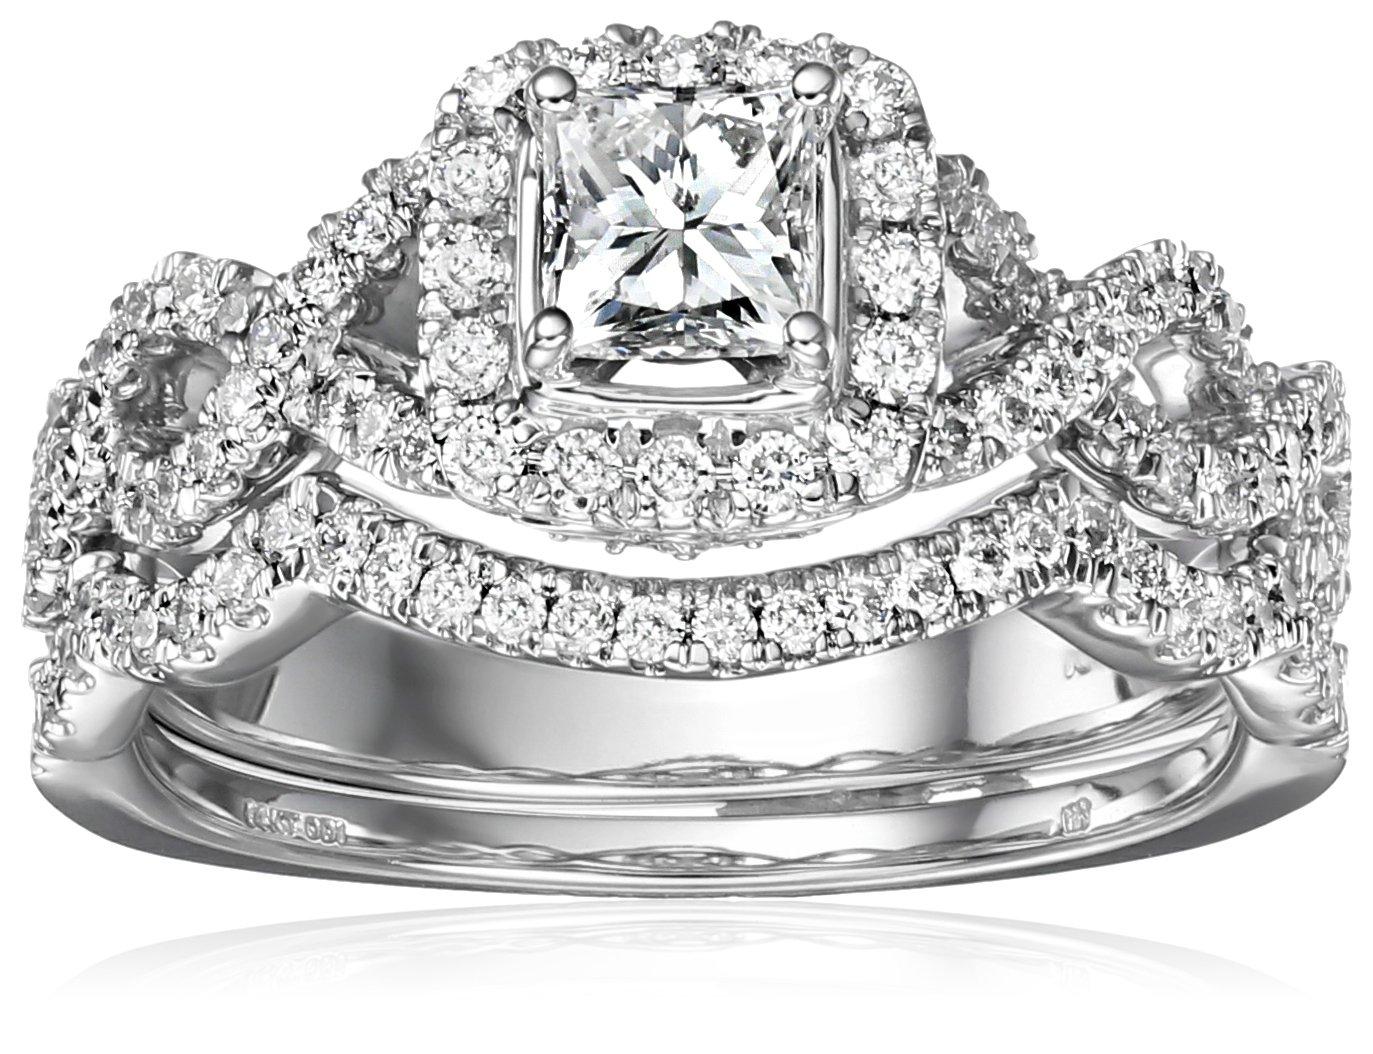 IGI Certified 14k White Gold Diamond Halo Infinity Twist Bridal with Princess-Cut Center Wedding Ring Set (1 cttw, H-I Color, I1-I2 Clarity), Size 7